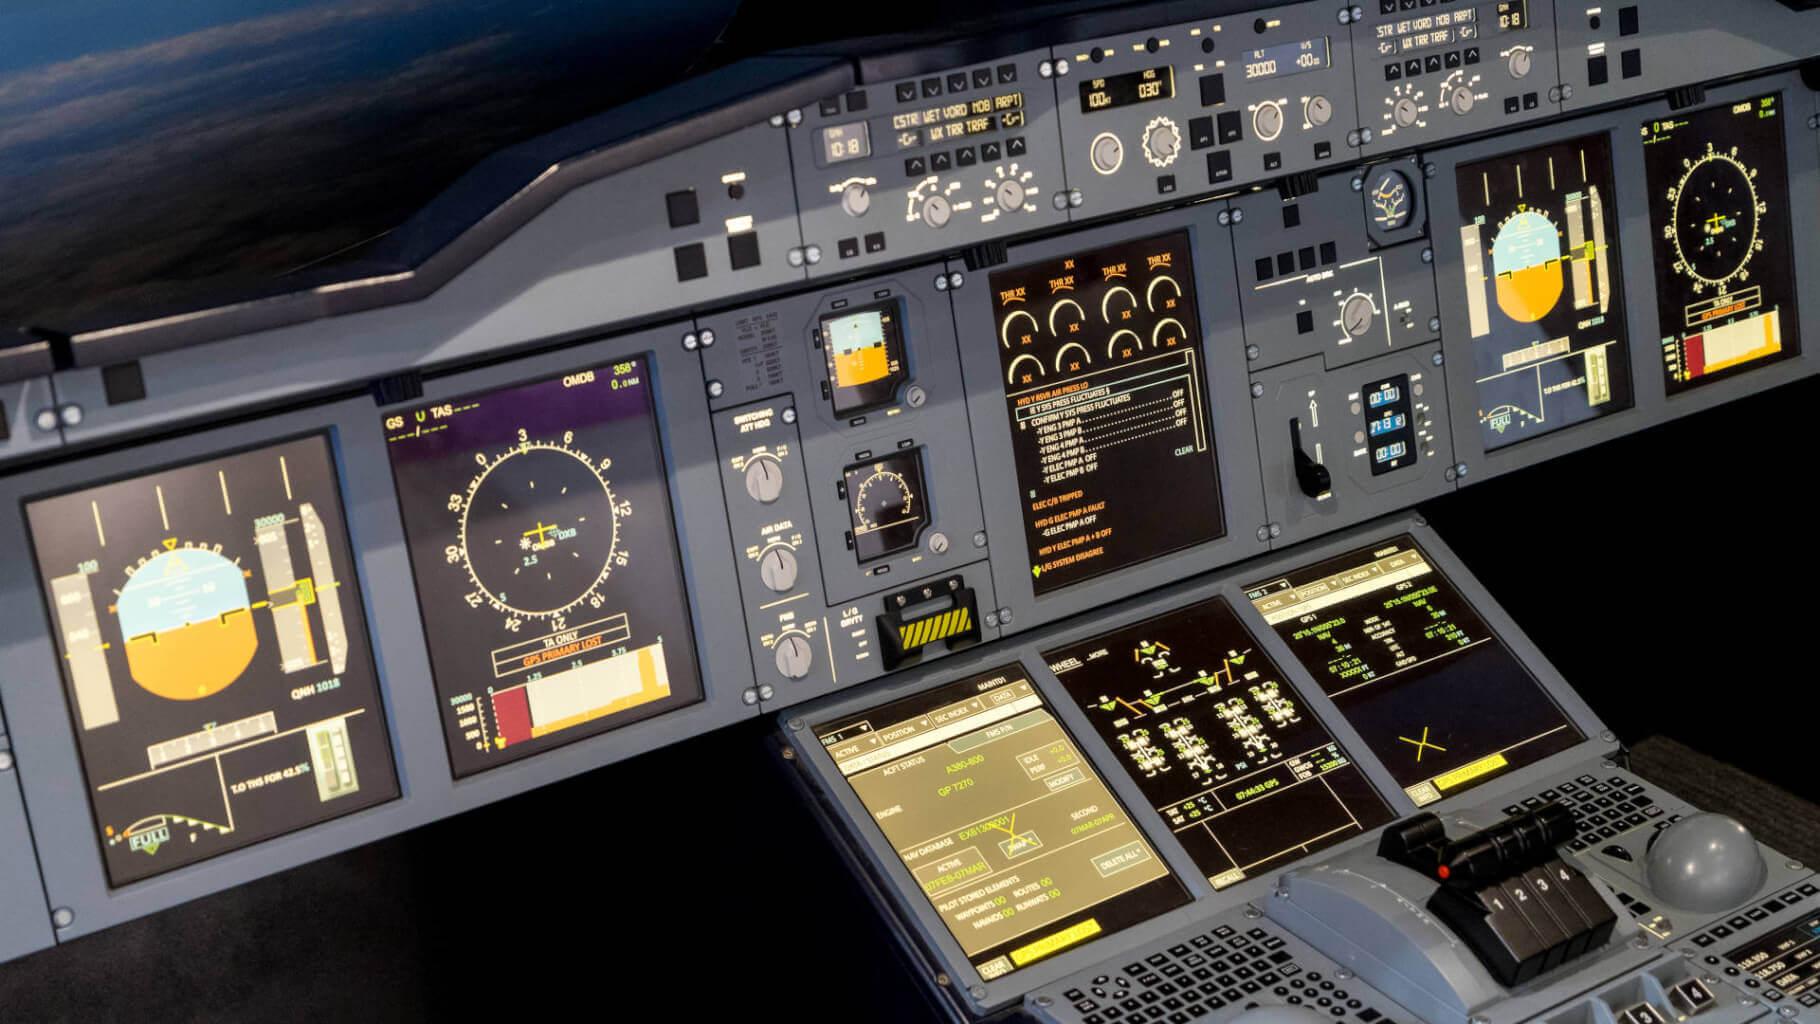 letecke simulatory boeing f-16 messerschmitt zazitkove lety